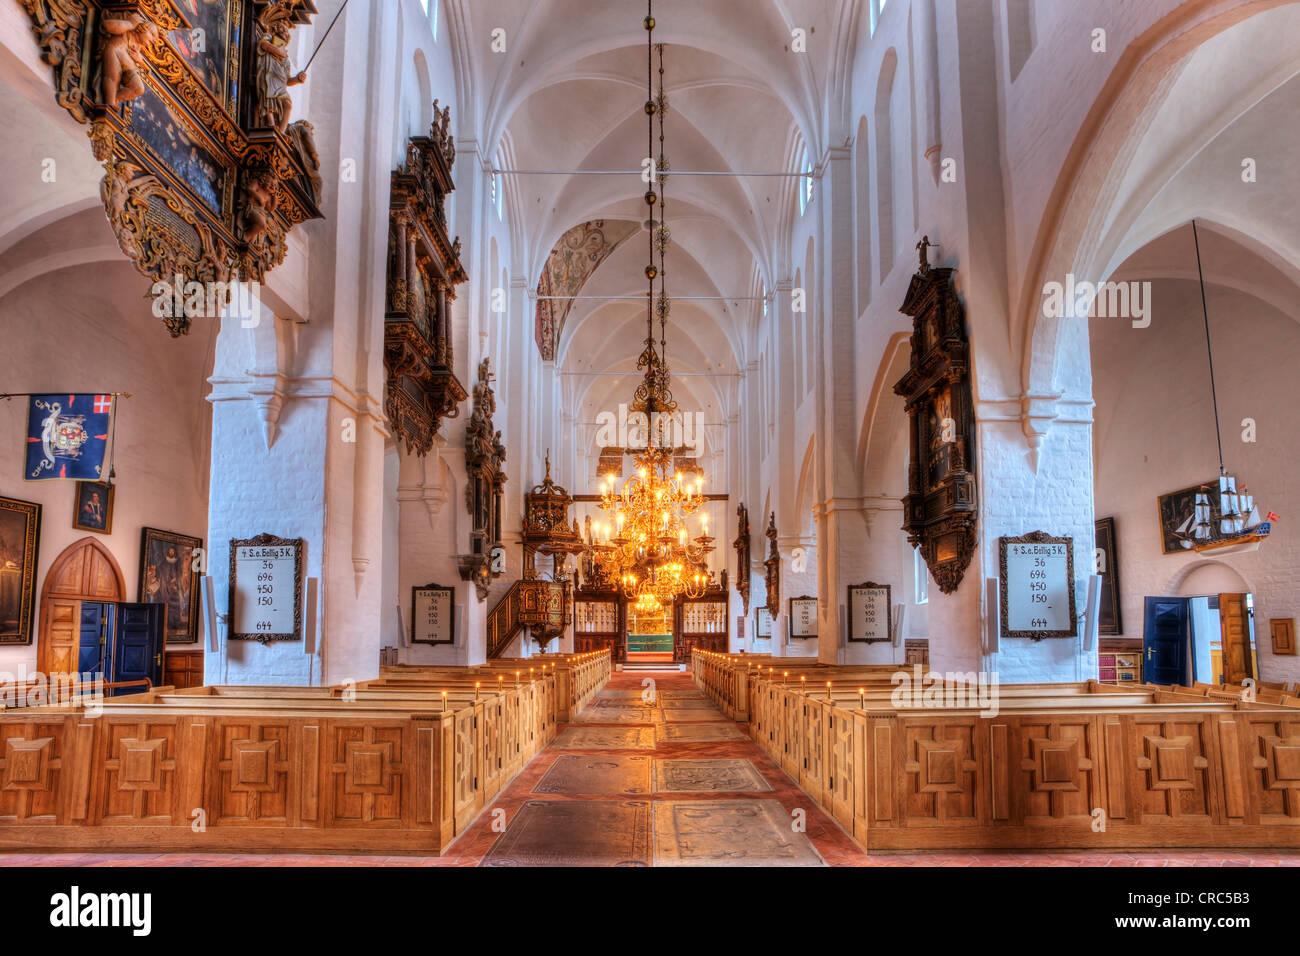 Interior, Sct. Olai Domkirke cathedral, Helsingør, Elsinore, Denmark, Europe - Stock Image